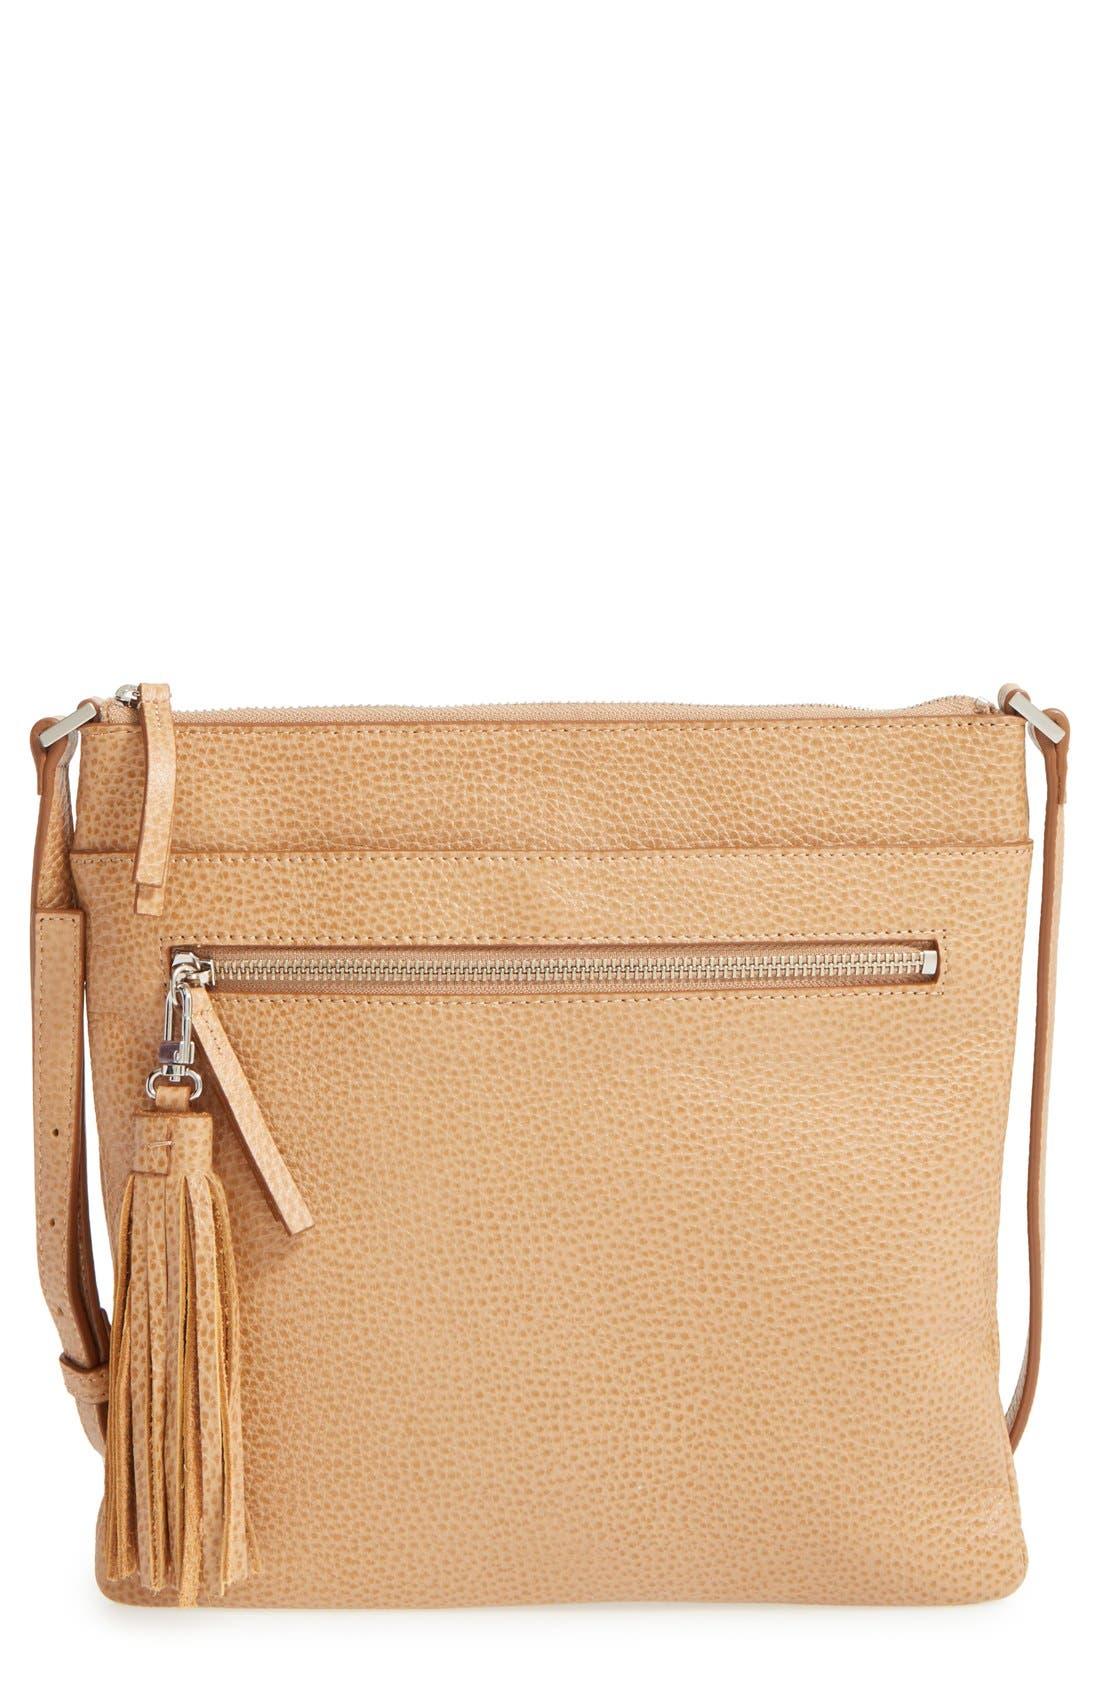 Alternate Image 1 Selected - Halogen® Tasseled Leather Crossbody Bag